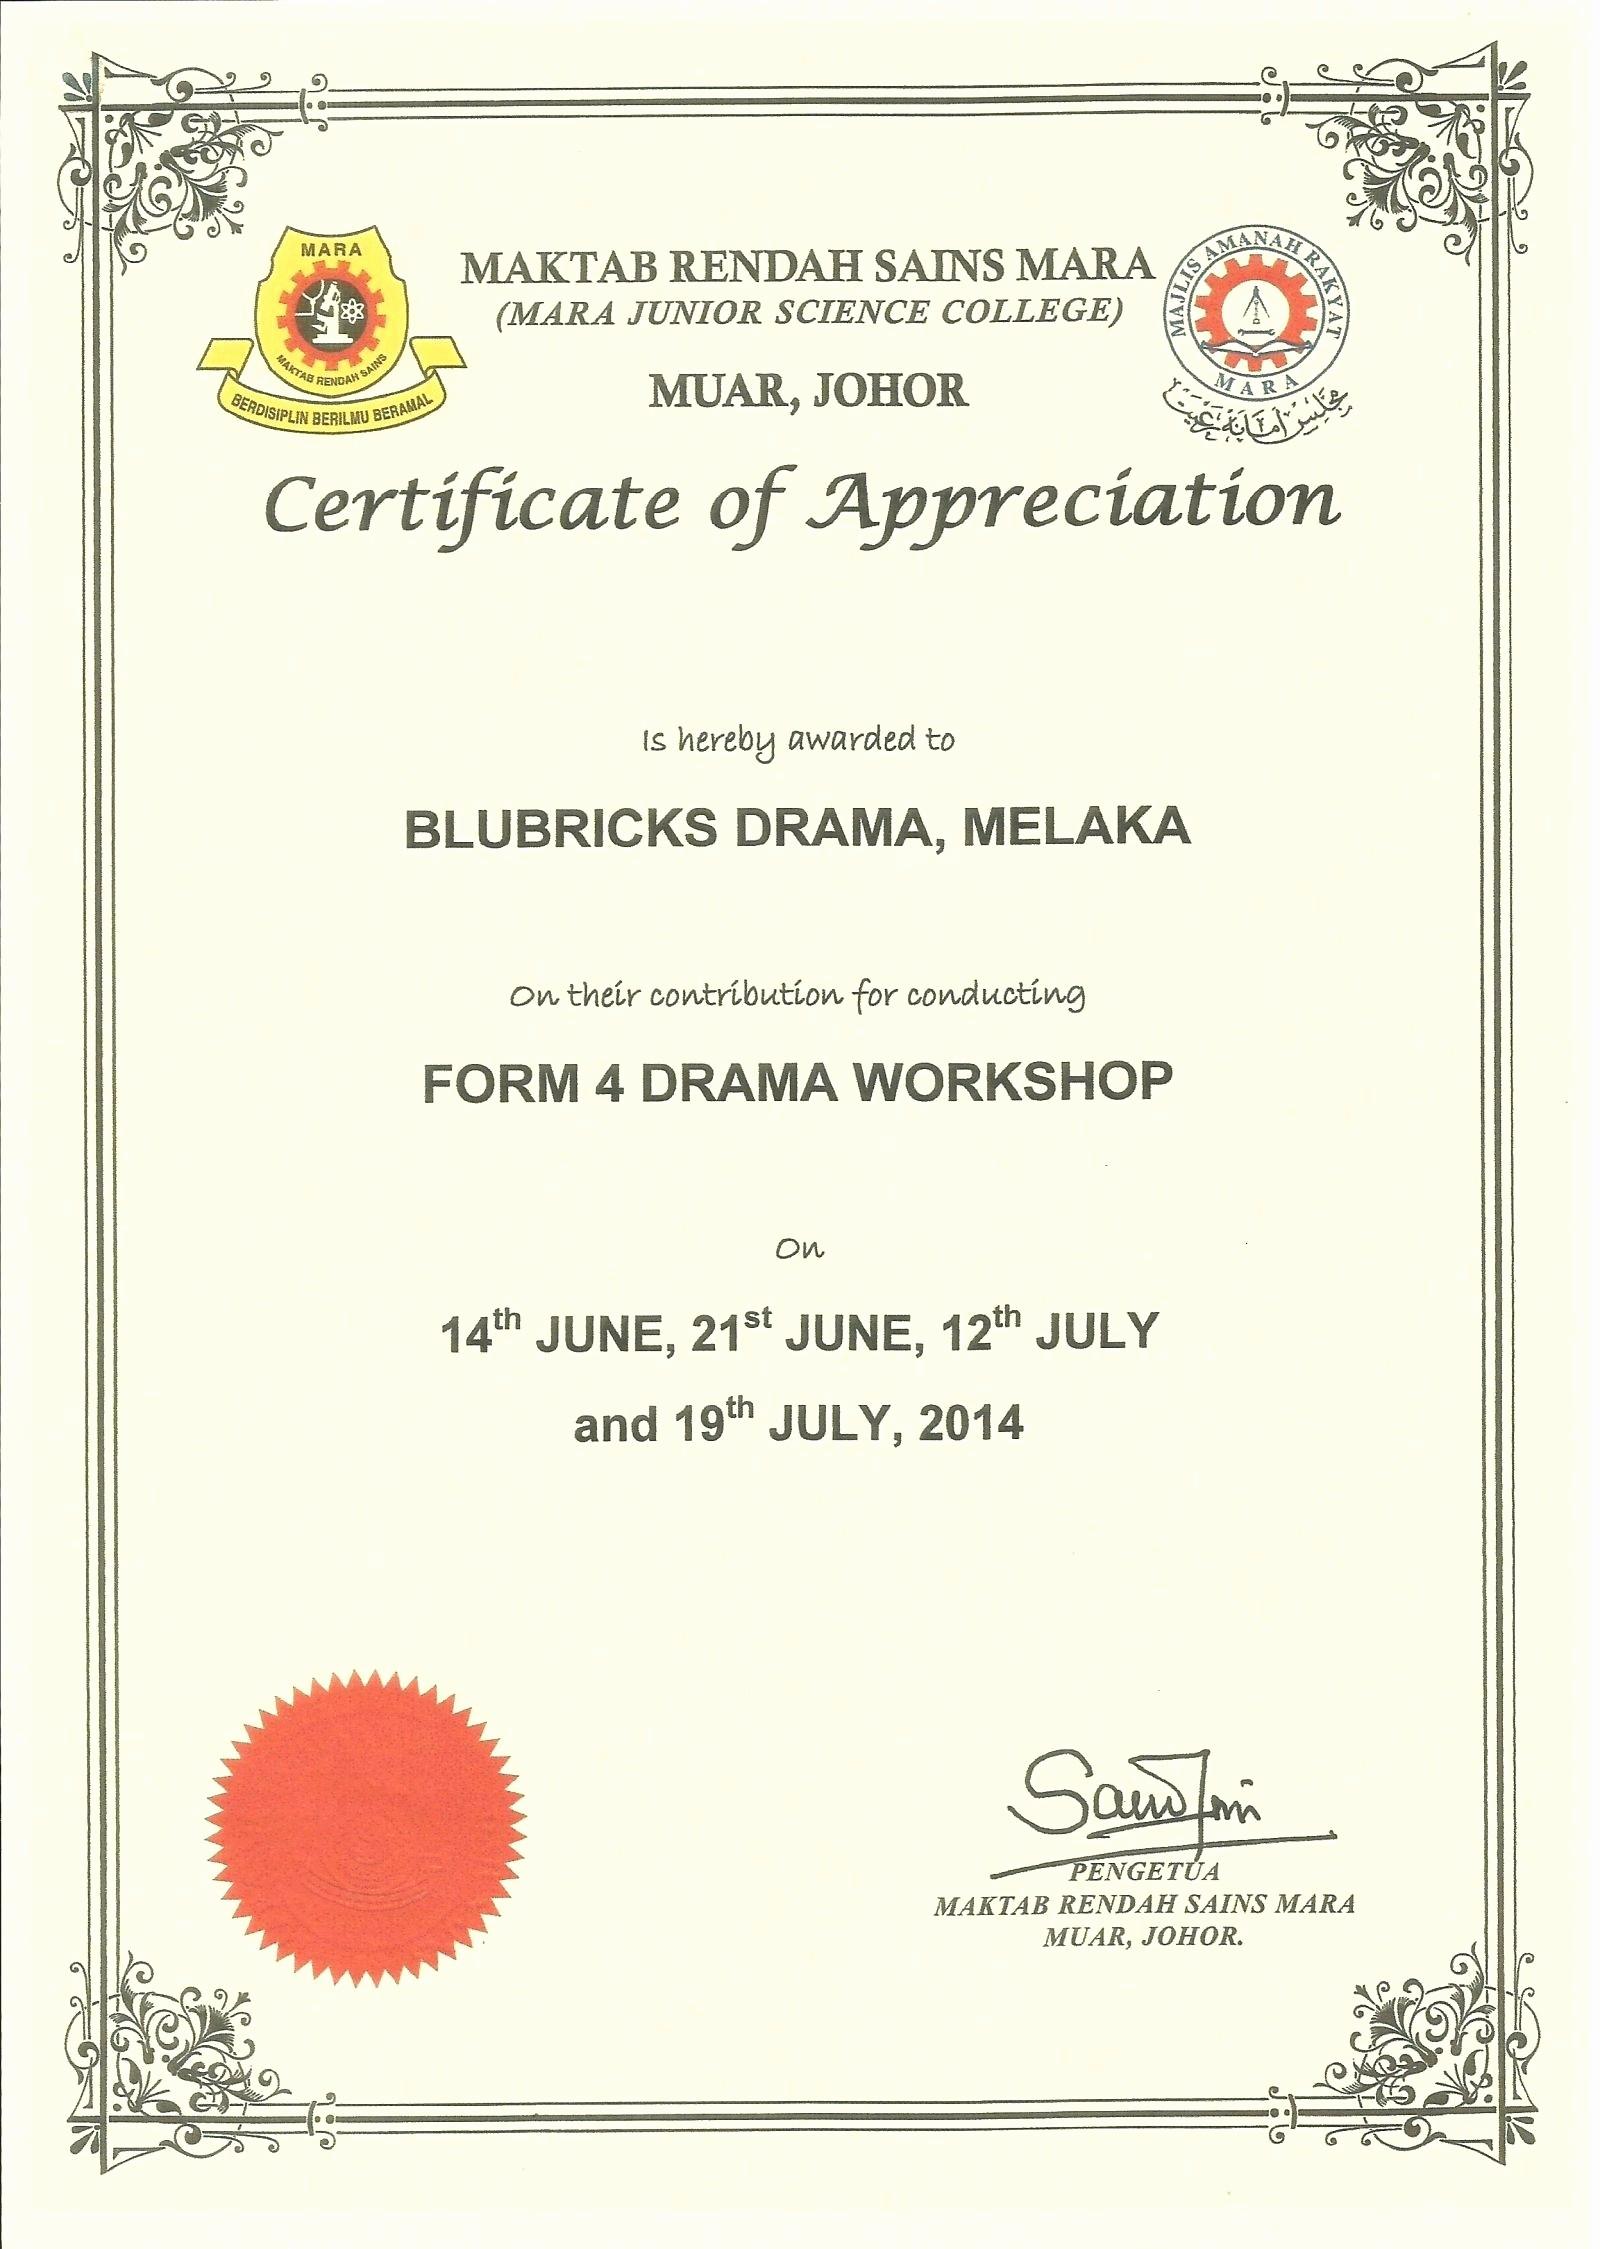 Template for Certificate Of Appreciation Awesome Template Volunteer Certificate Appreciation Template